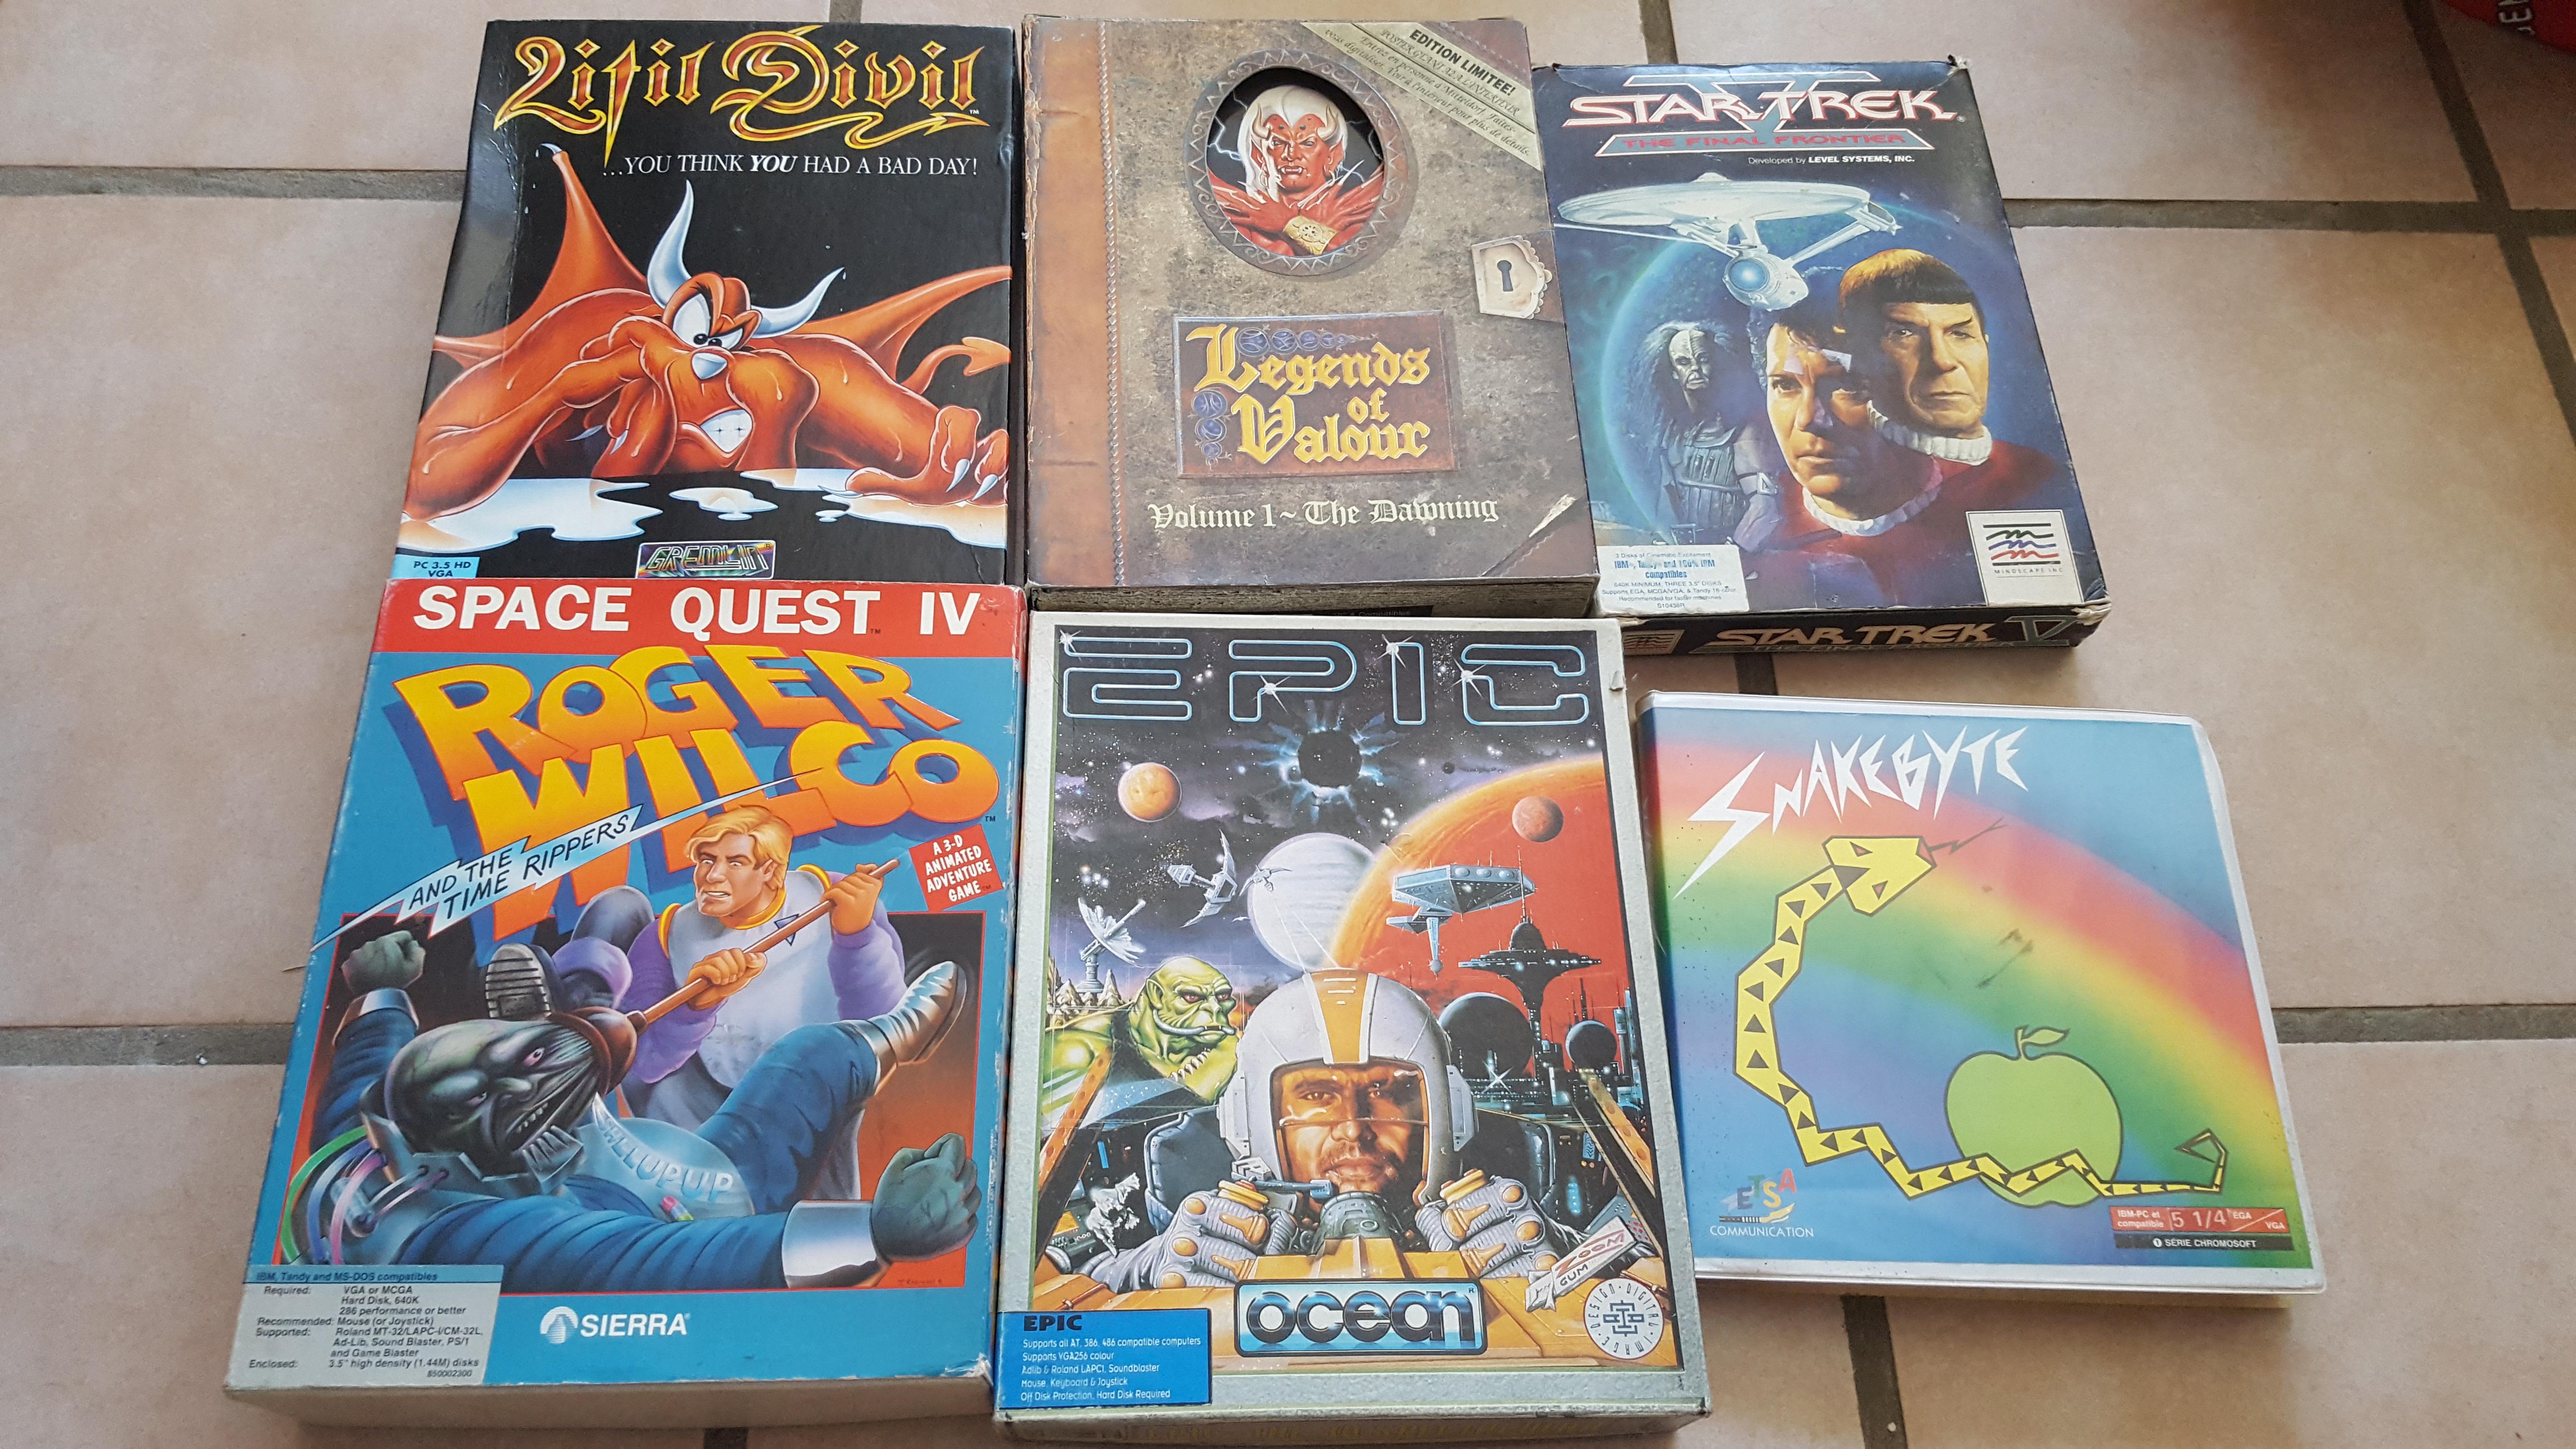 Vente ordinateurs et jeux Atari, Amiga, Amstrad et PC MAJ 20/01 JVjwO